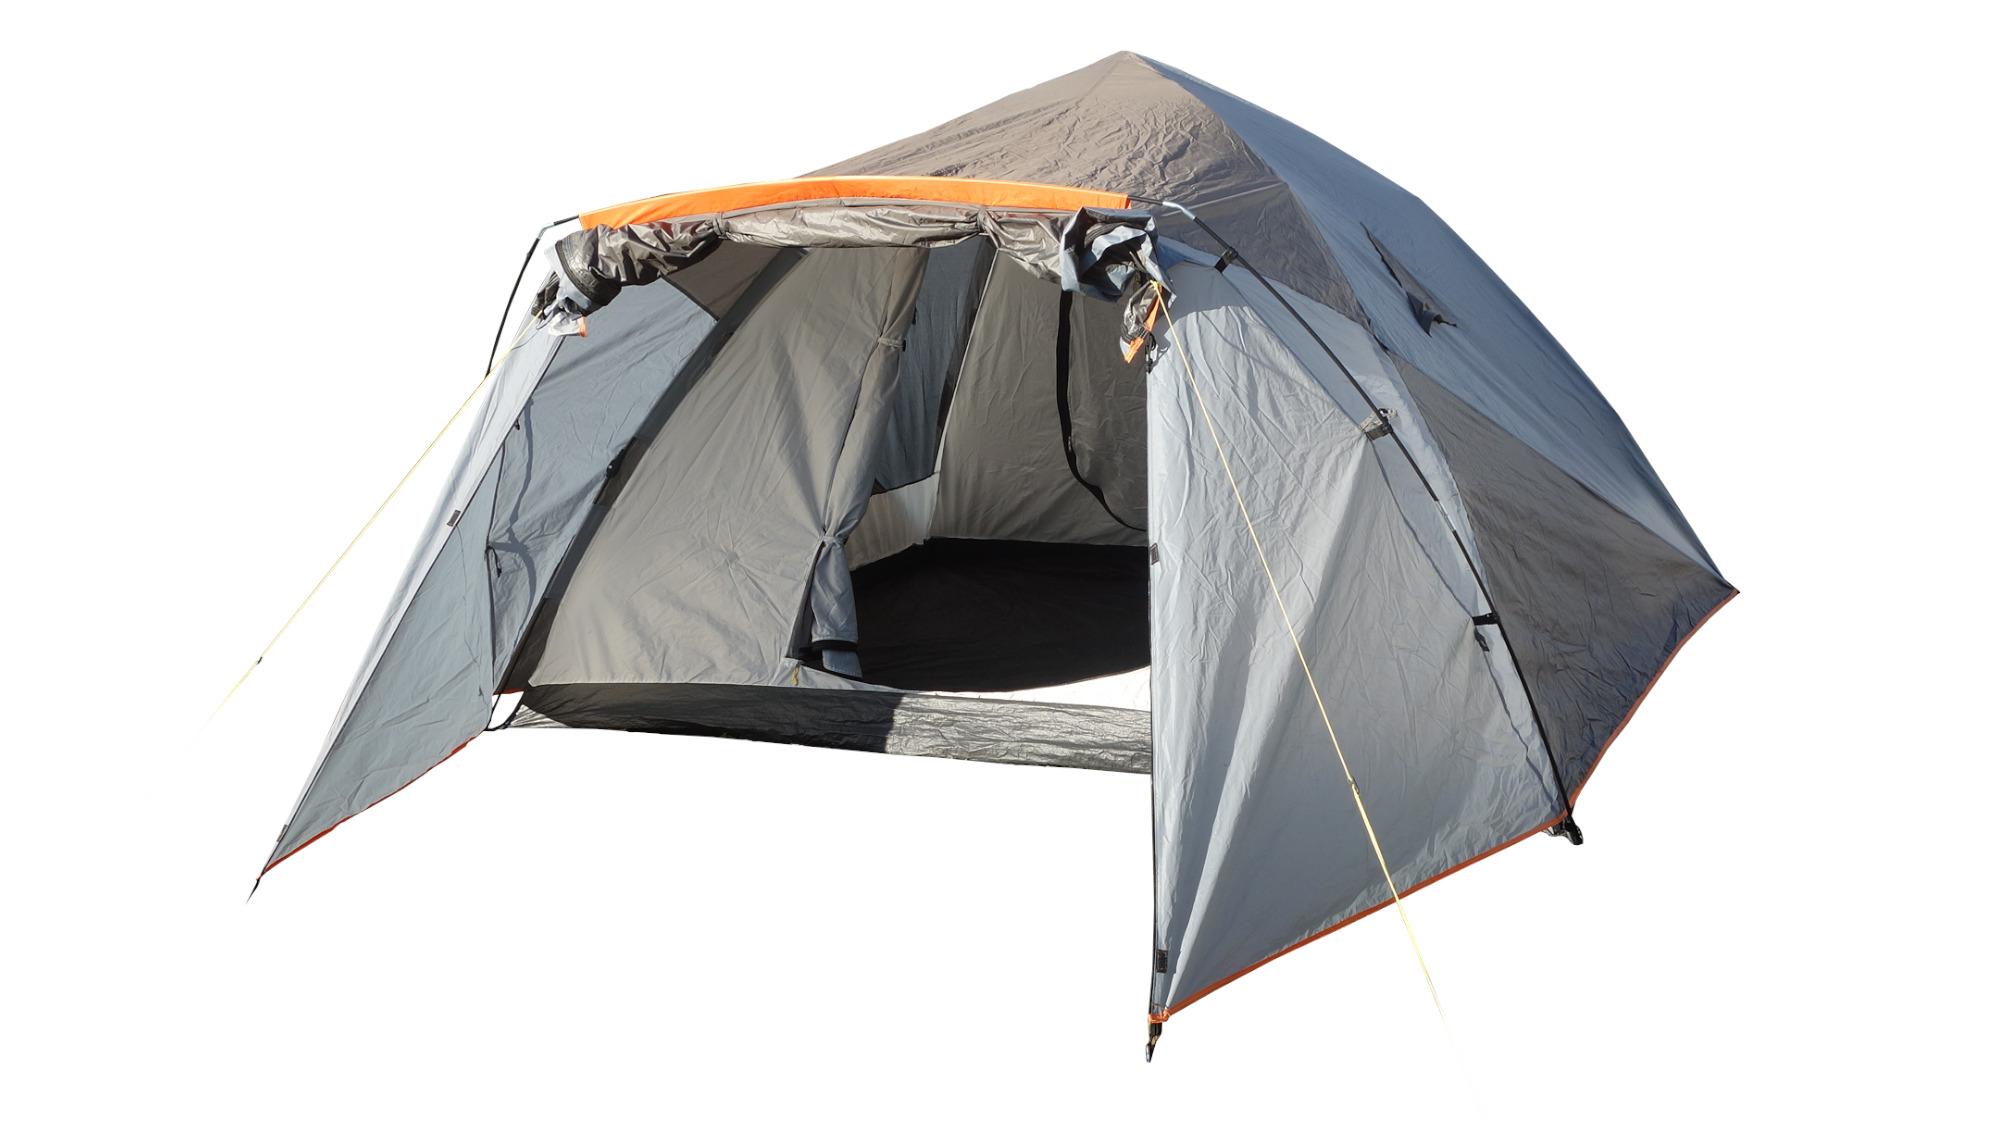 6-Personen Zelt leihen